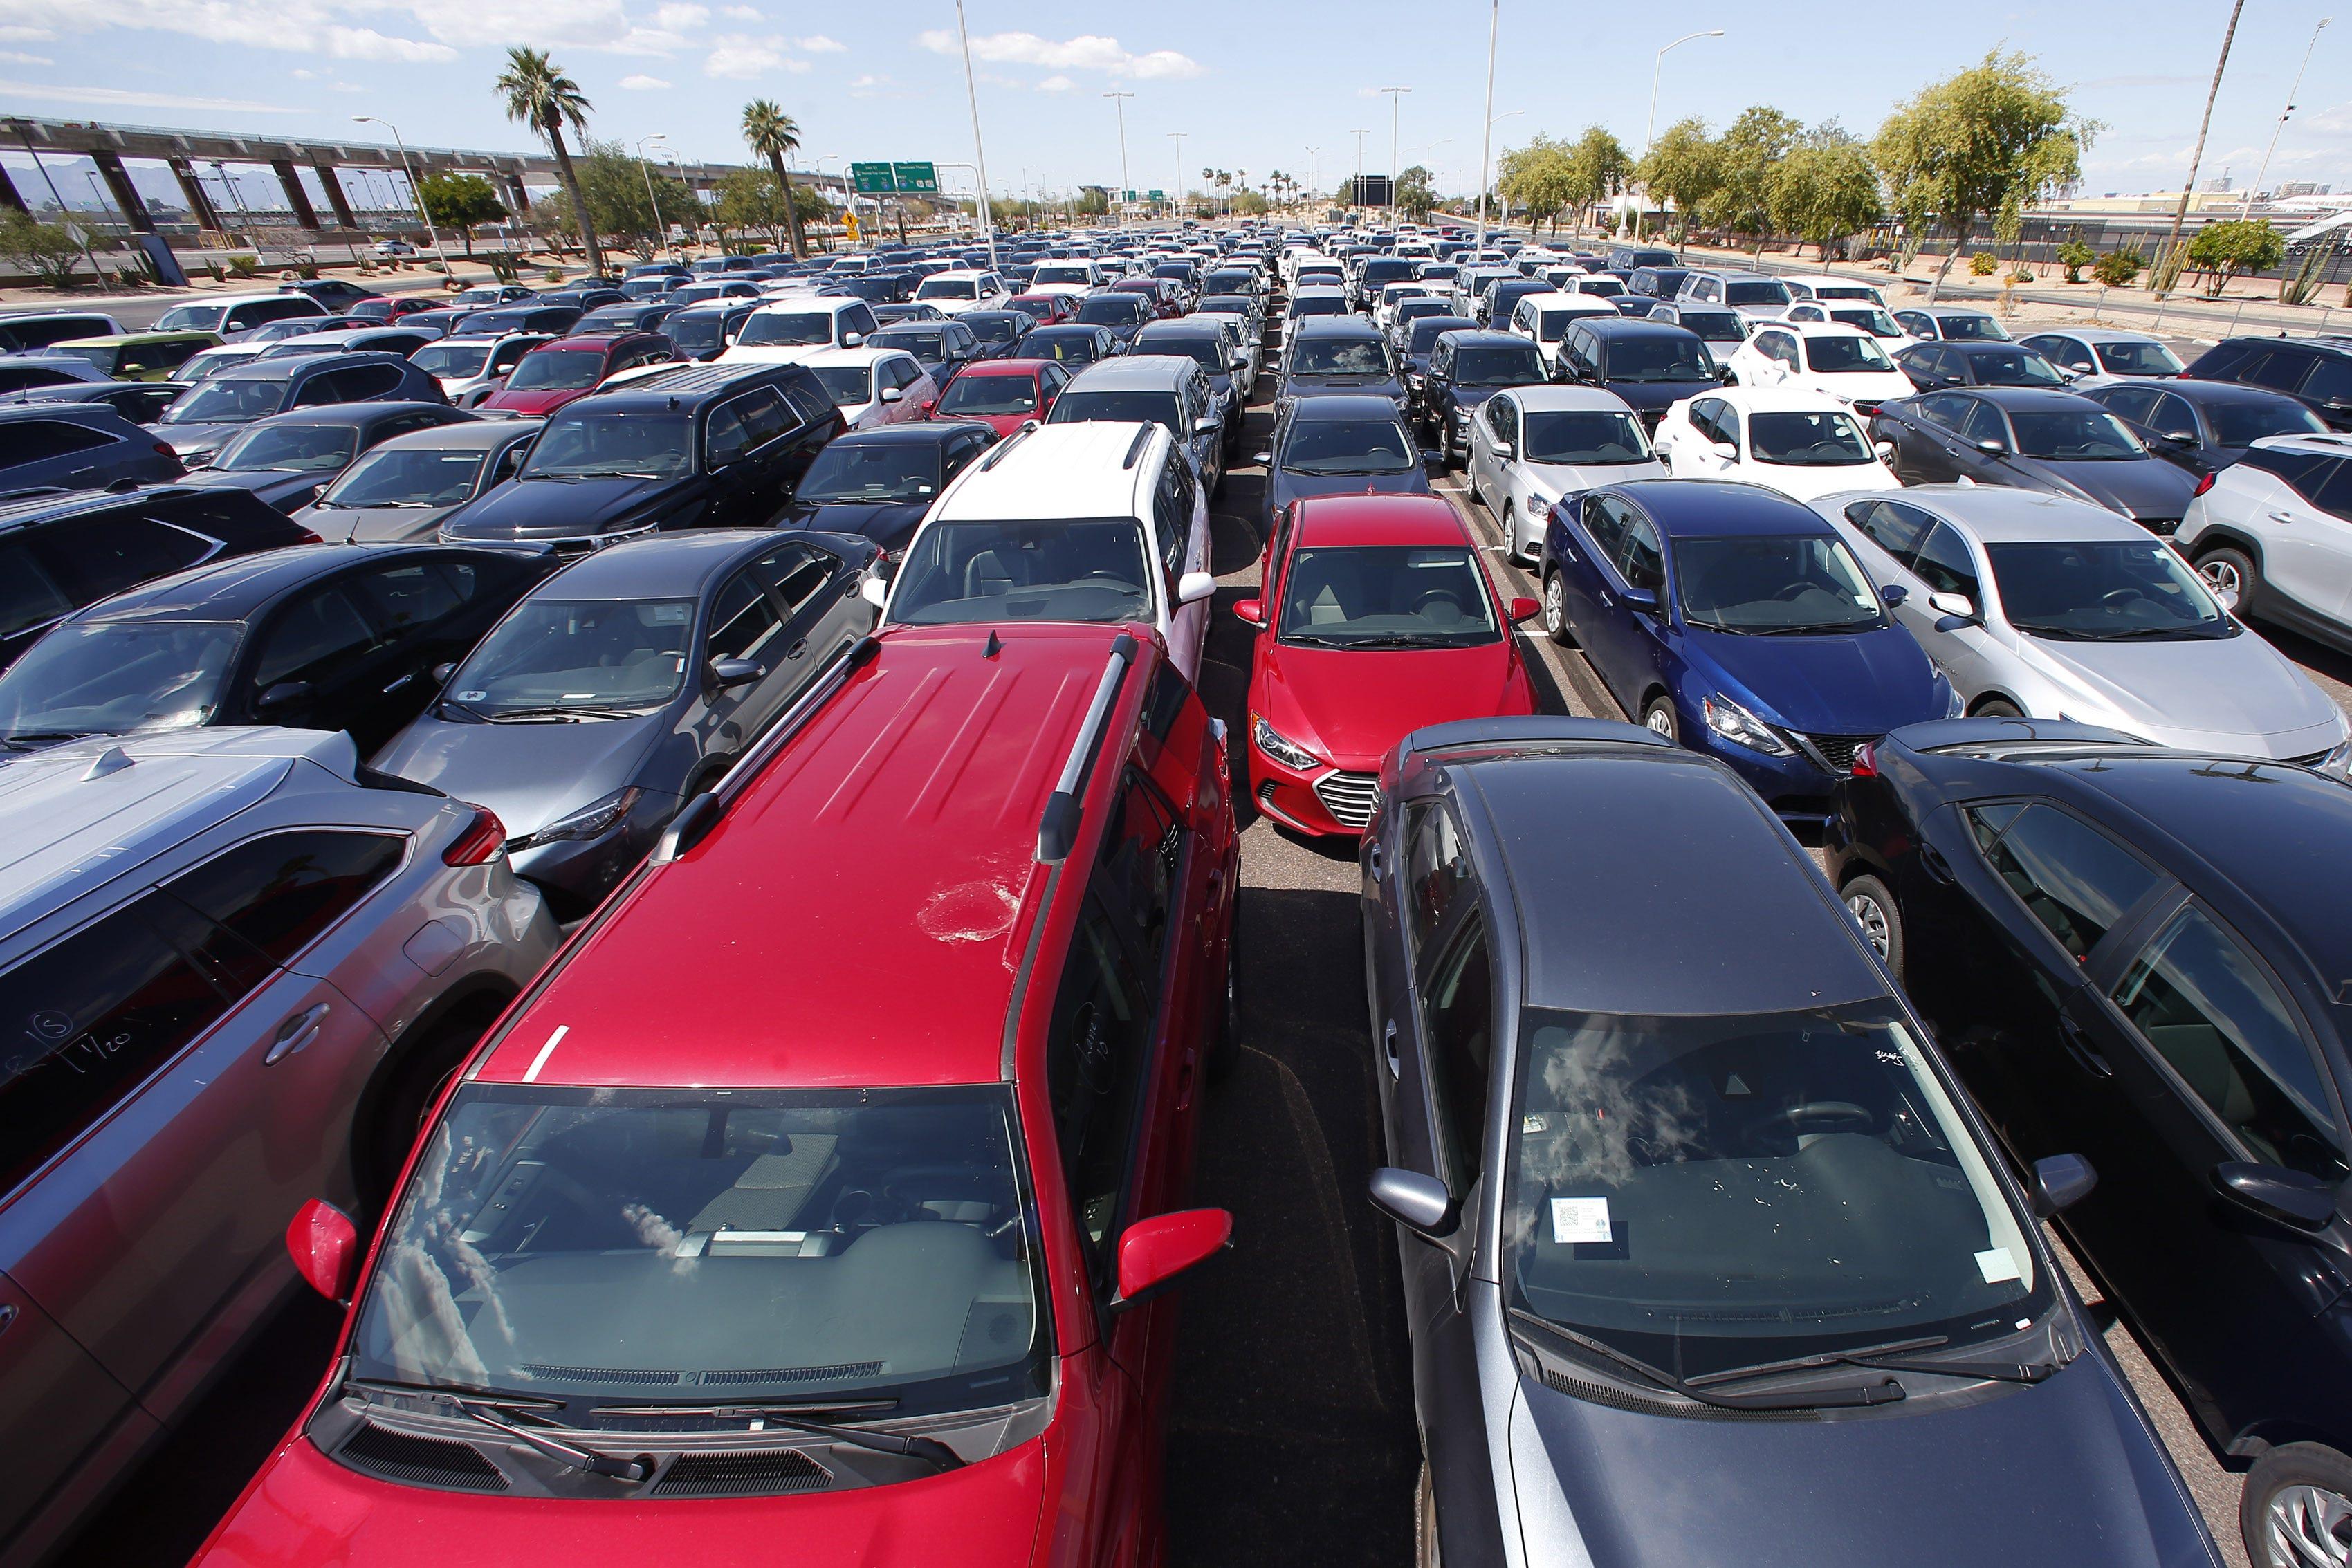 Rental cars are stacking up in Arizona as coronavirus keeps travelers away